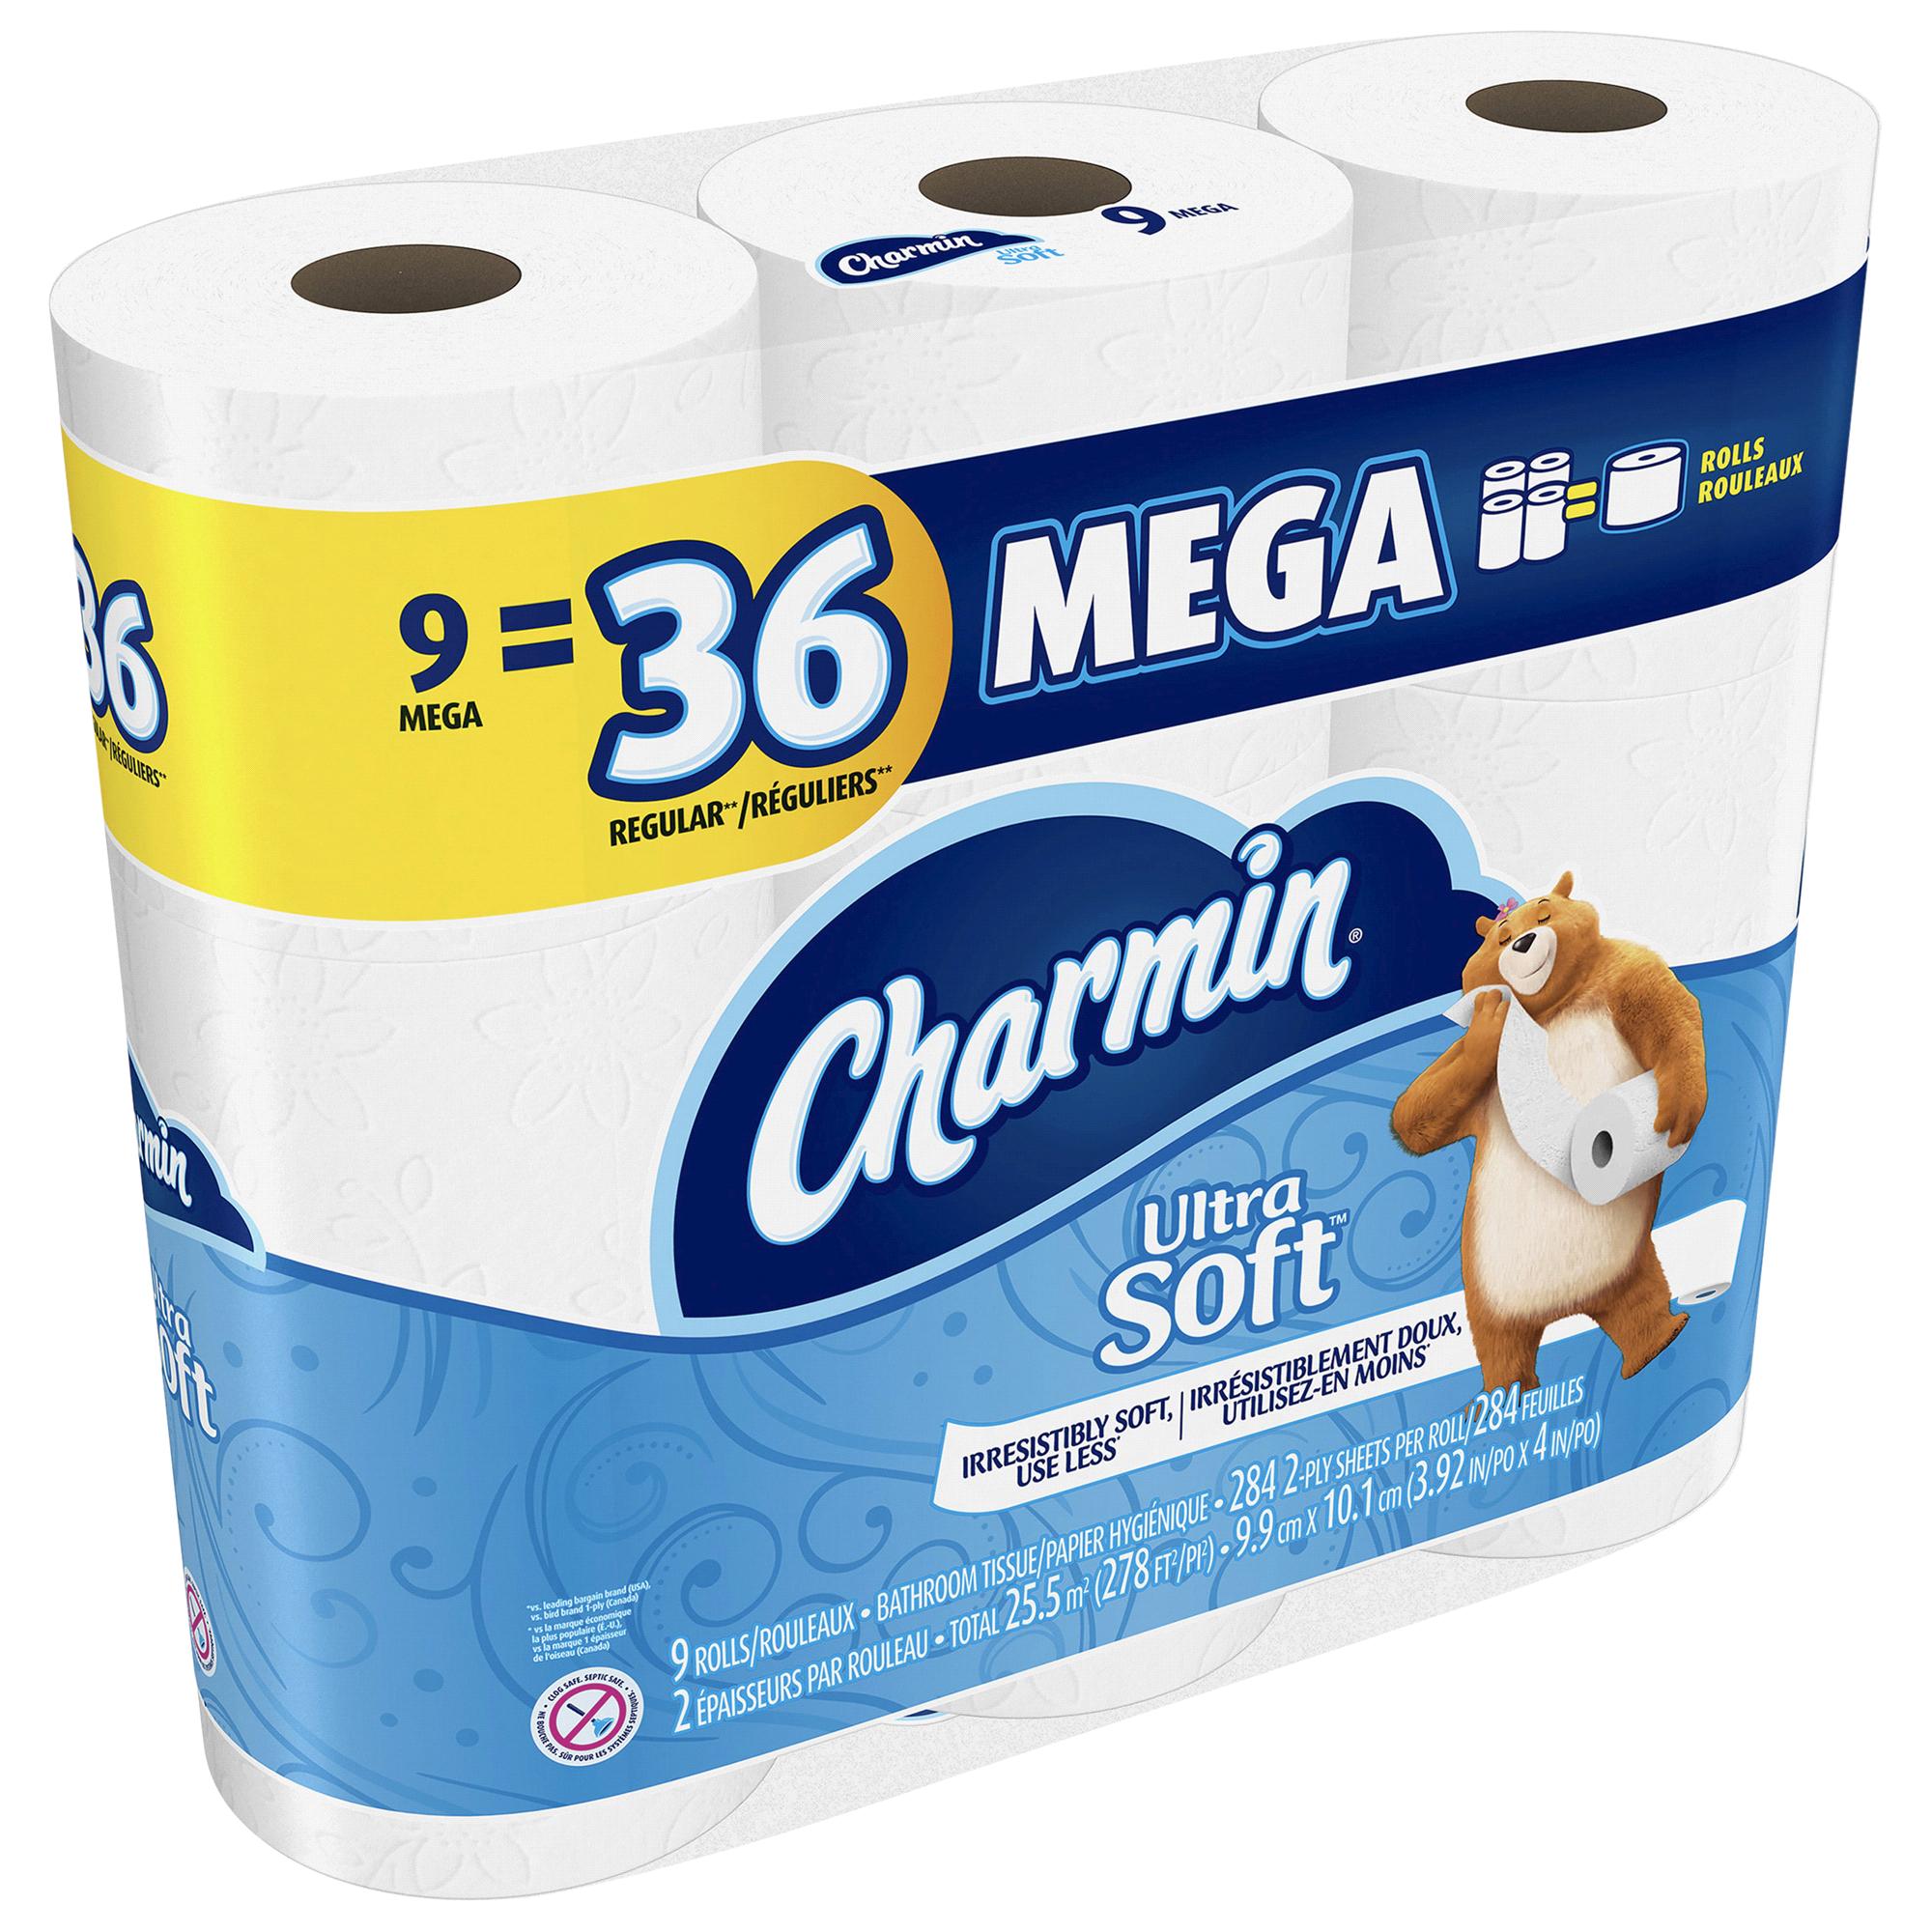 Charmin Ultra Soft Toilet Paper 9 Mega Rolls | Meijer.com